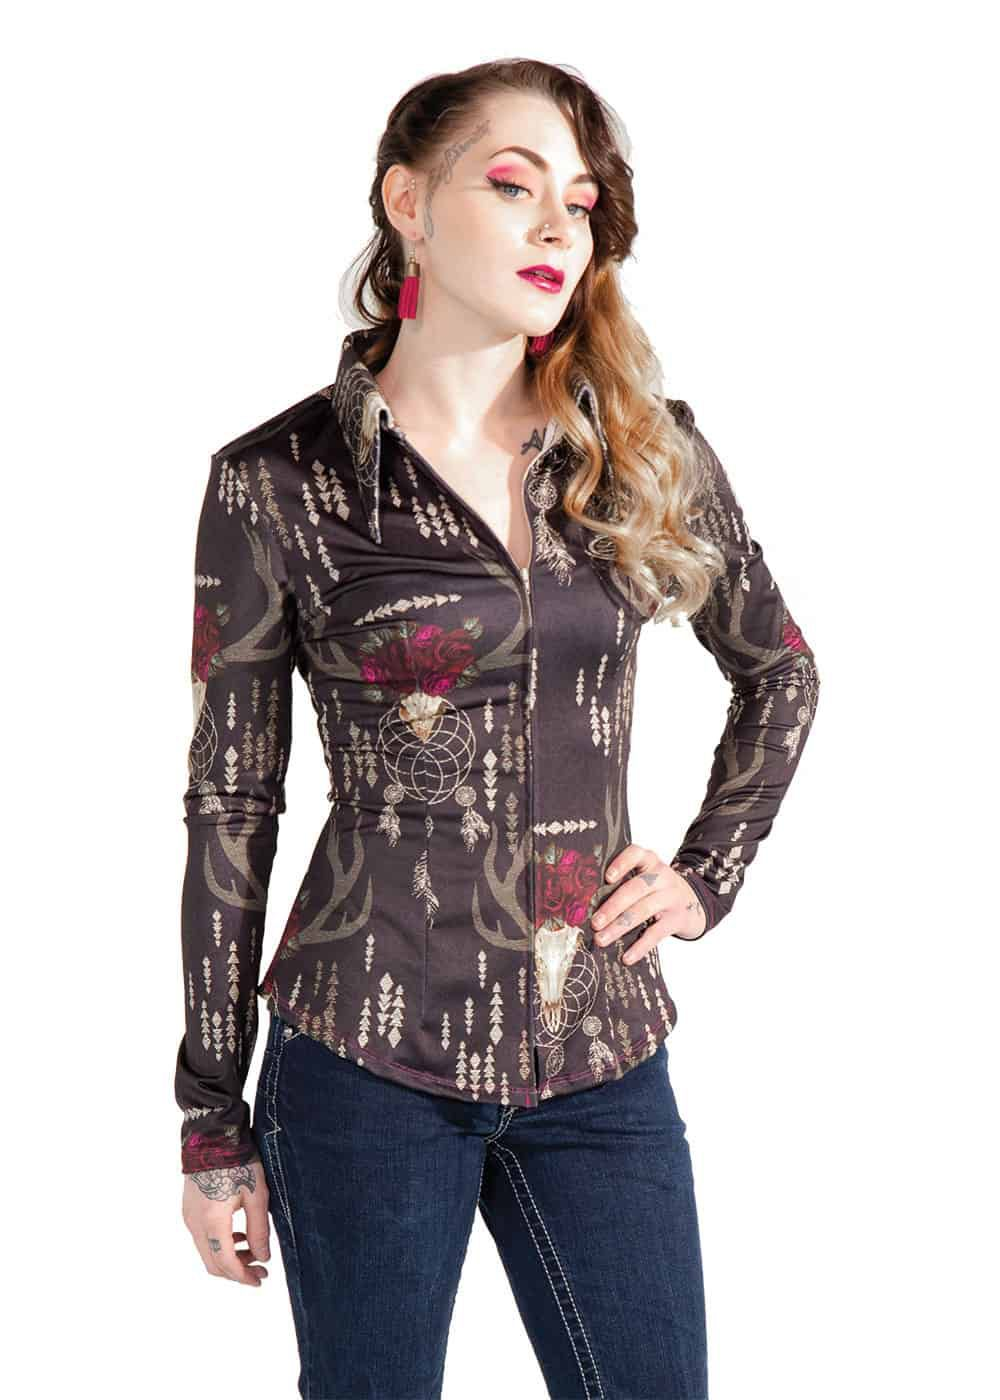 boho berry top sundial show clothing cowgirl magazine